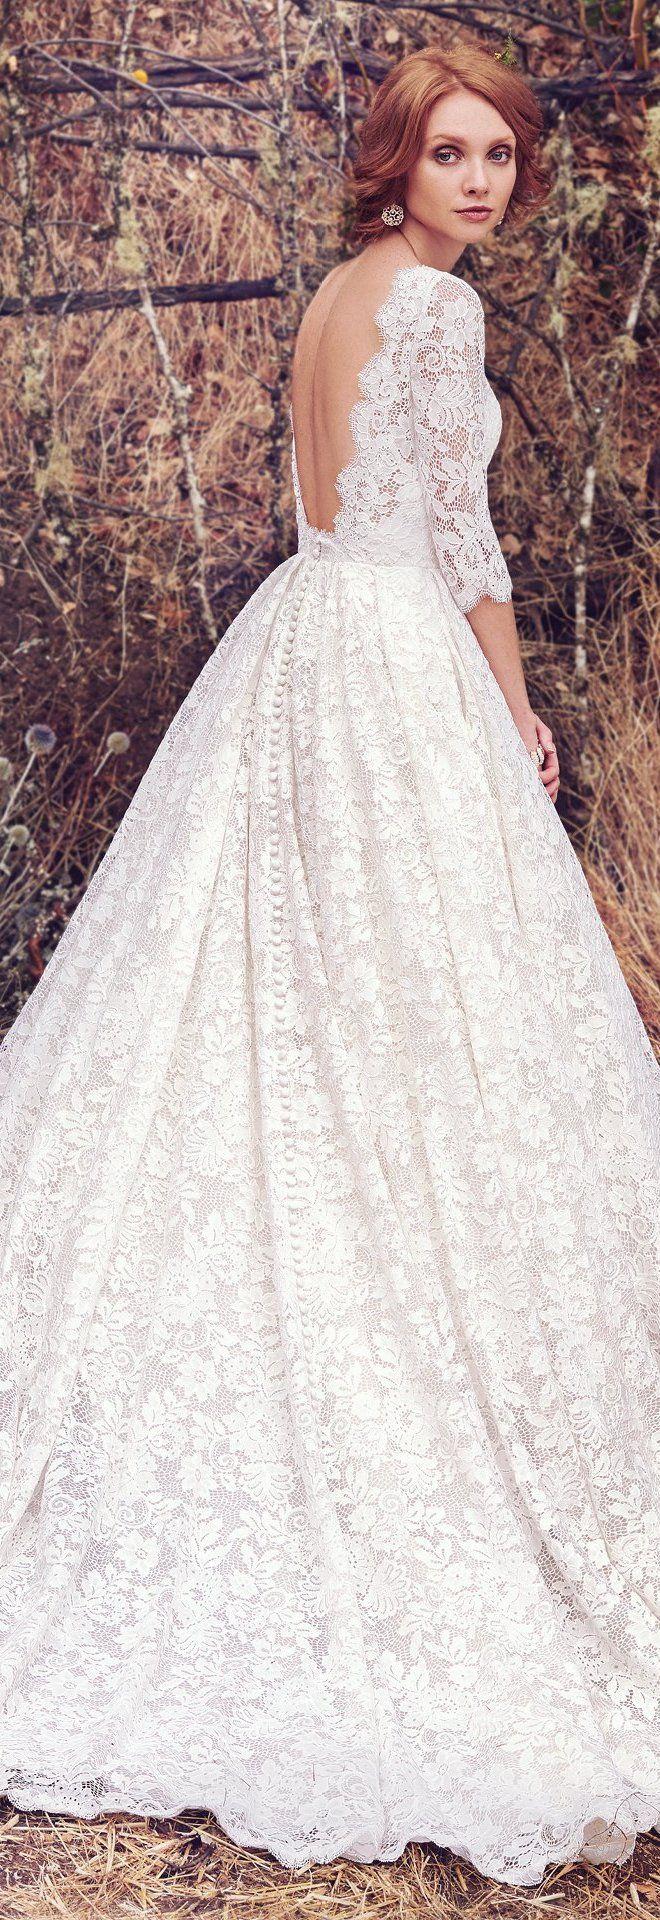 #dressoftheweek #Maggiesottero #bridalGown